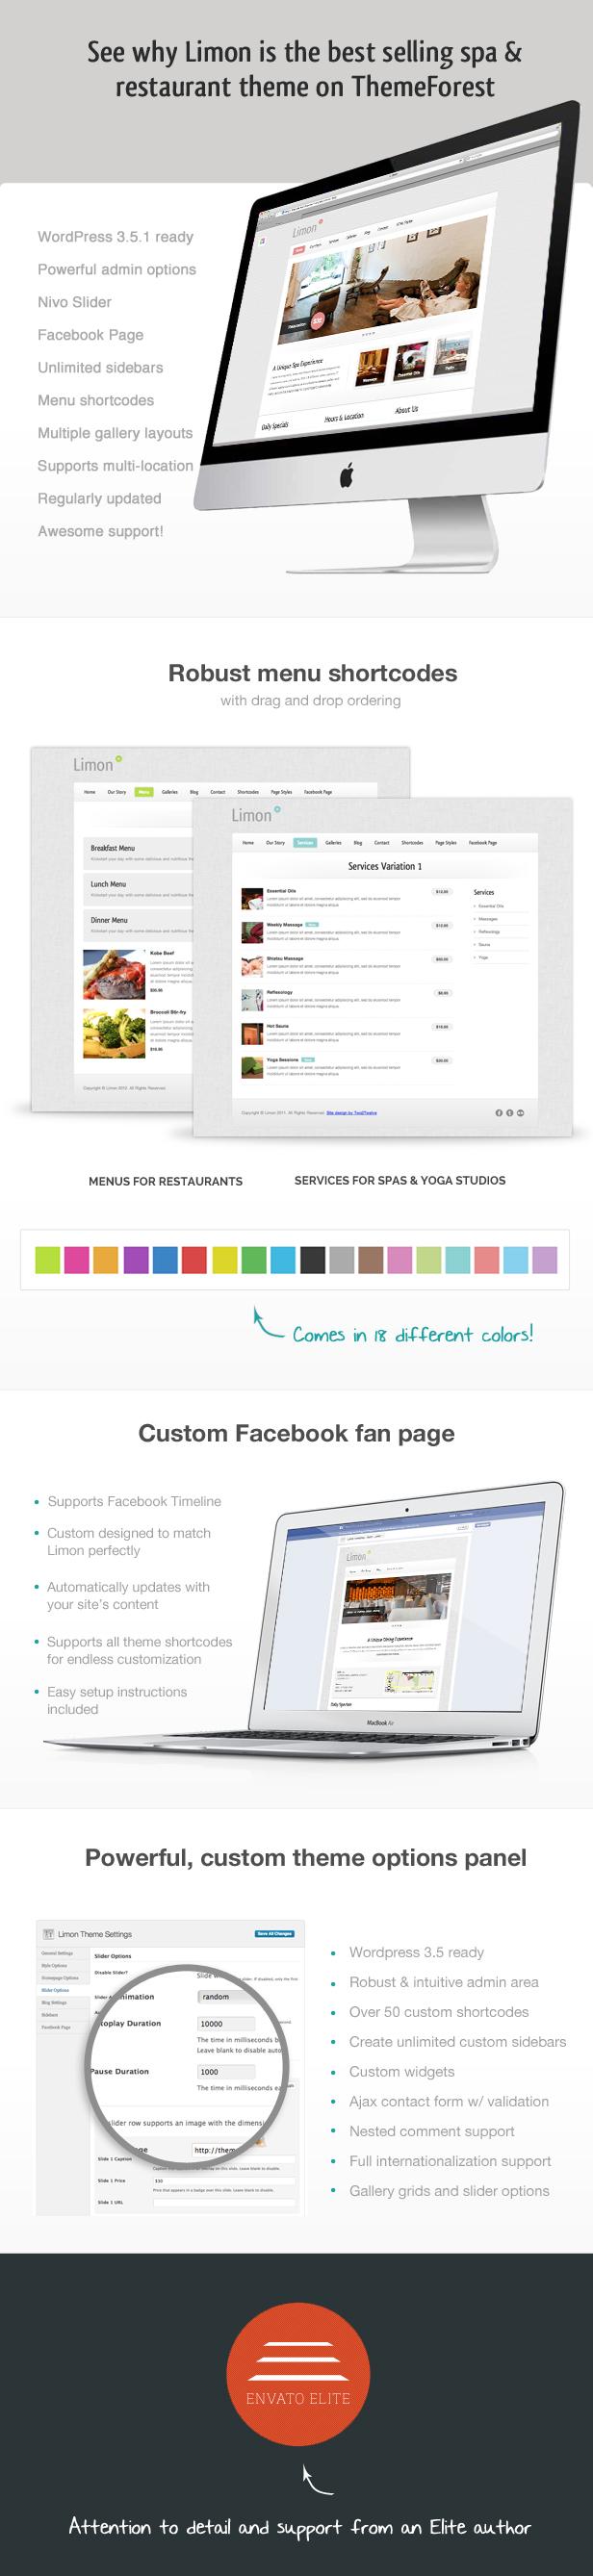 Limon - A Restaurant and Spa WordPress Theme - 1